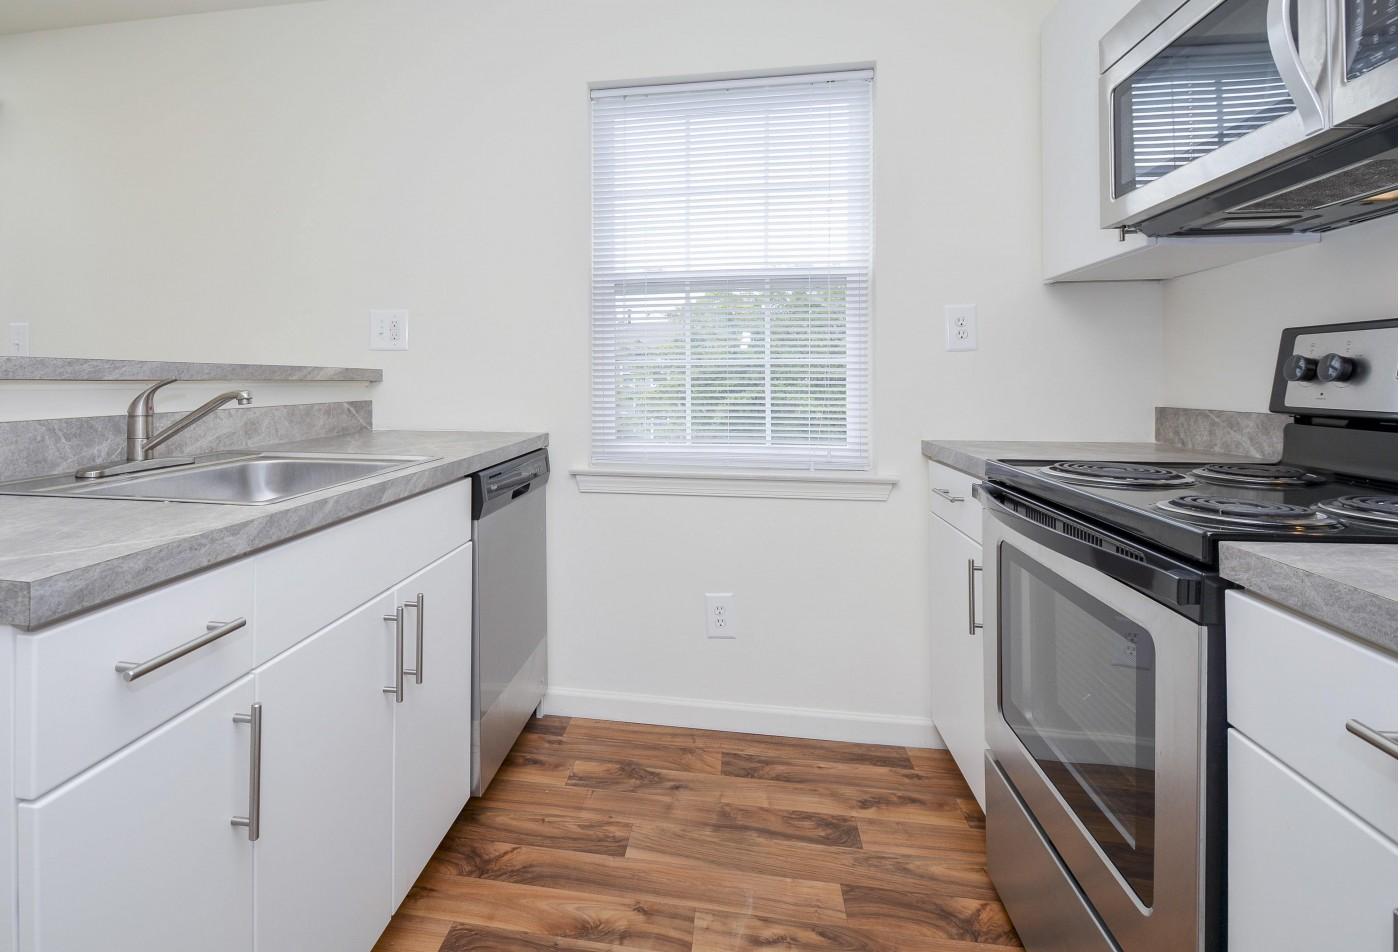 Apartment Homes in Marlton, NJ | Willlow Ridge Village Apartments